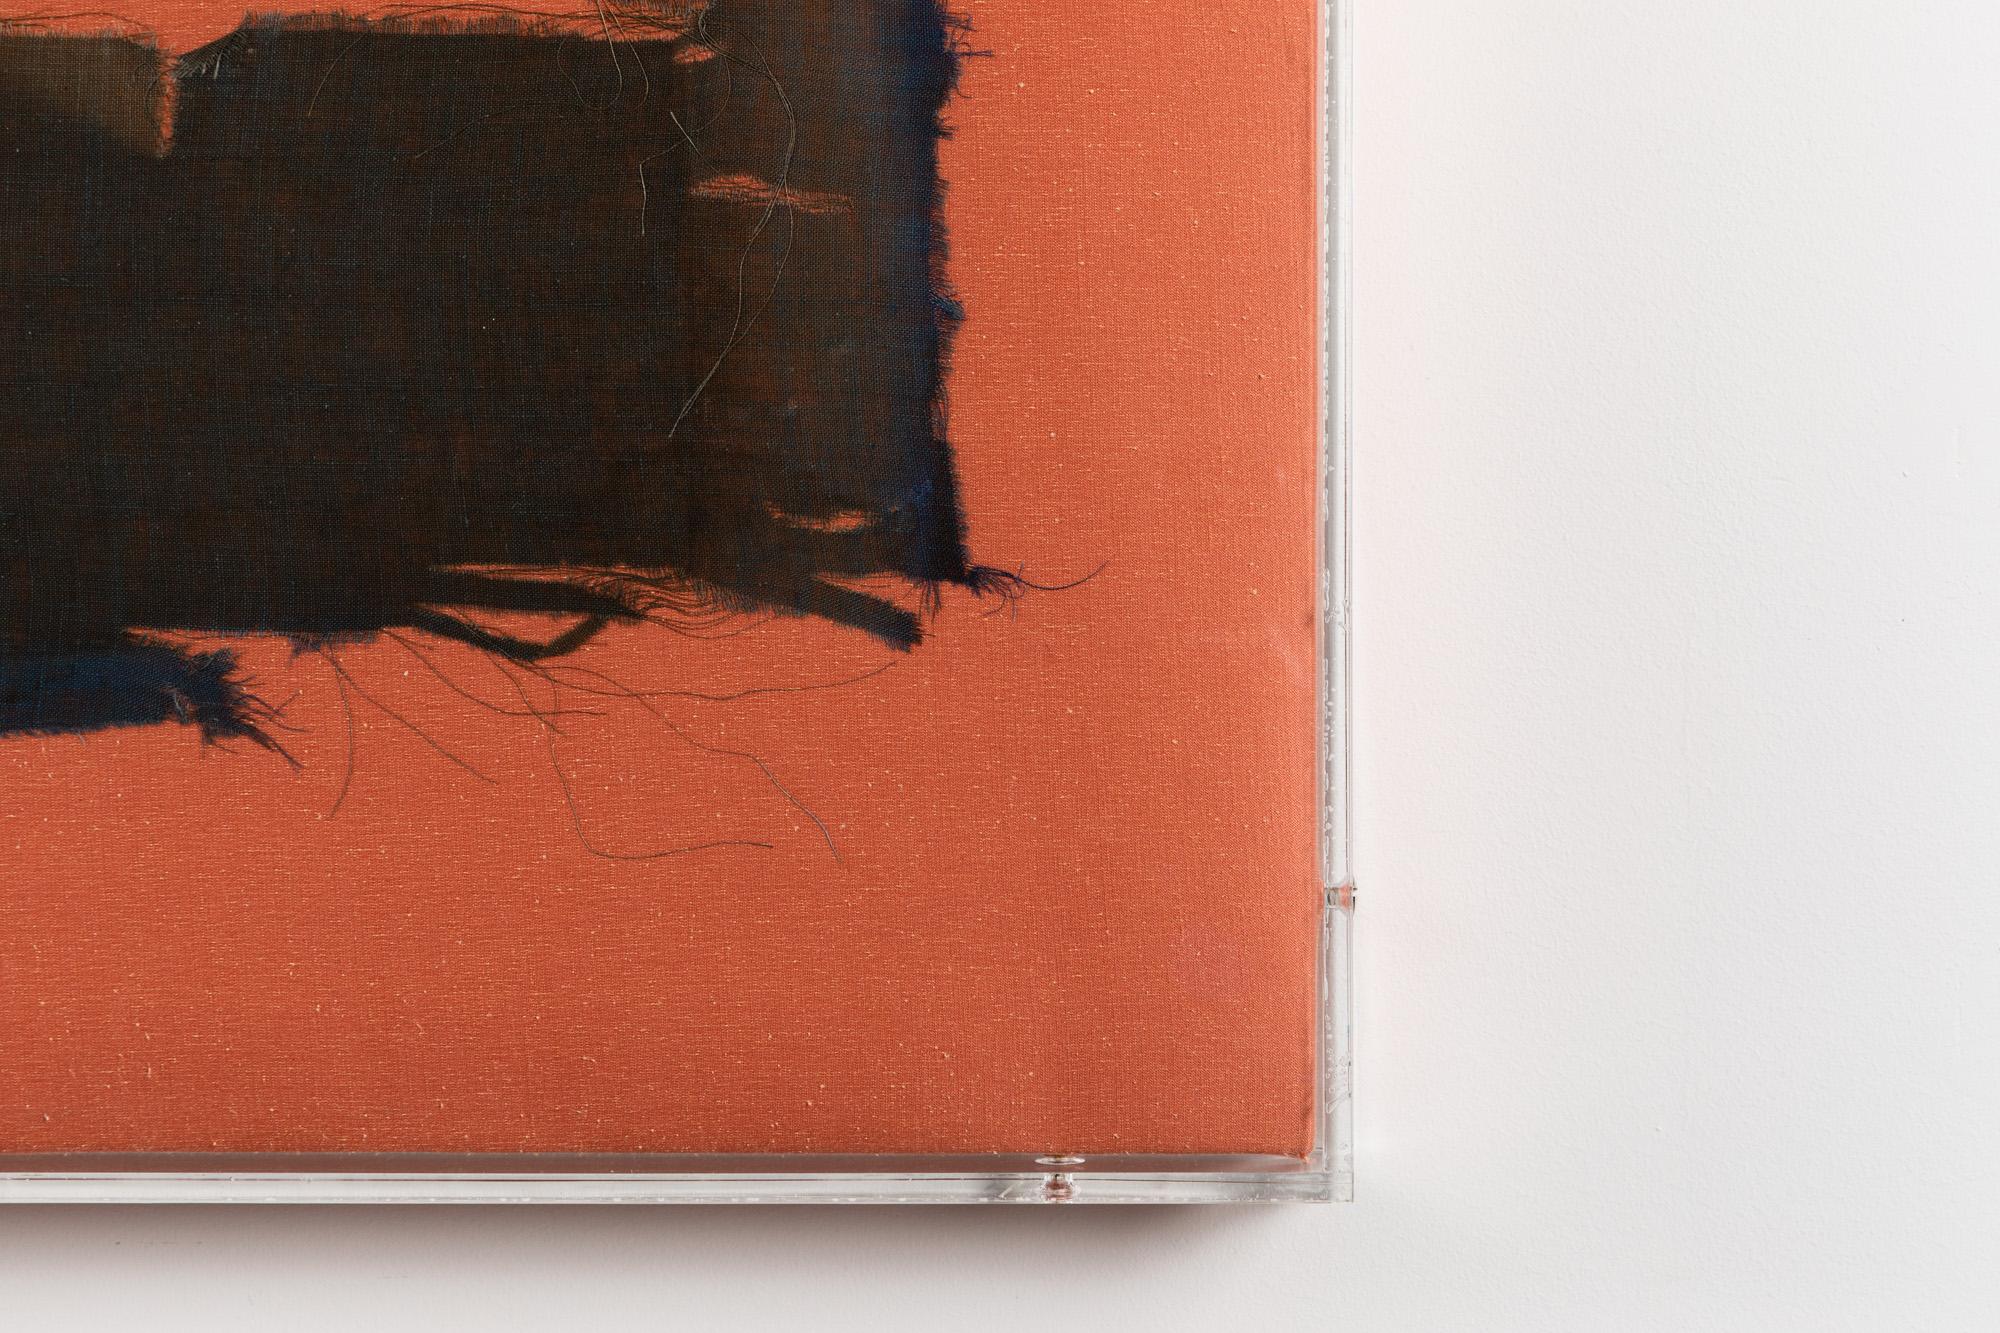 Minimal Information Peach Piano, 2020. Textiles in artist's frame (plexiglass, wood and aluminum), 110 x 146,5 x 5 cm. Detail